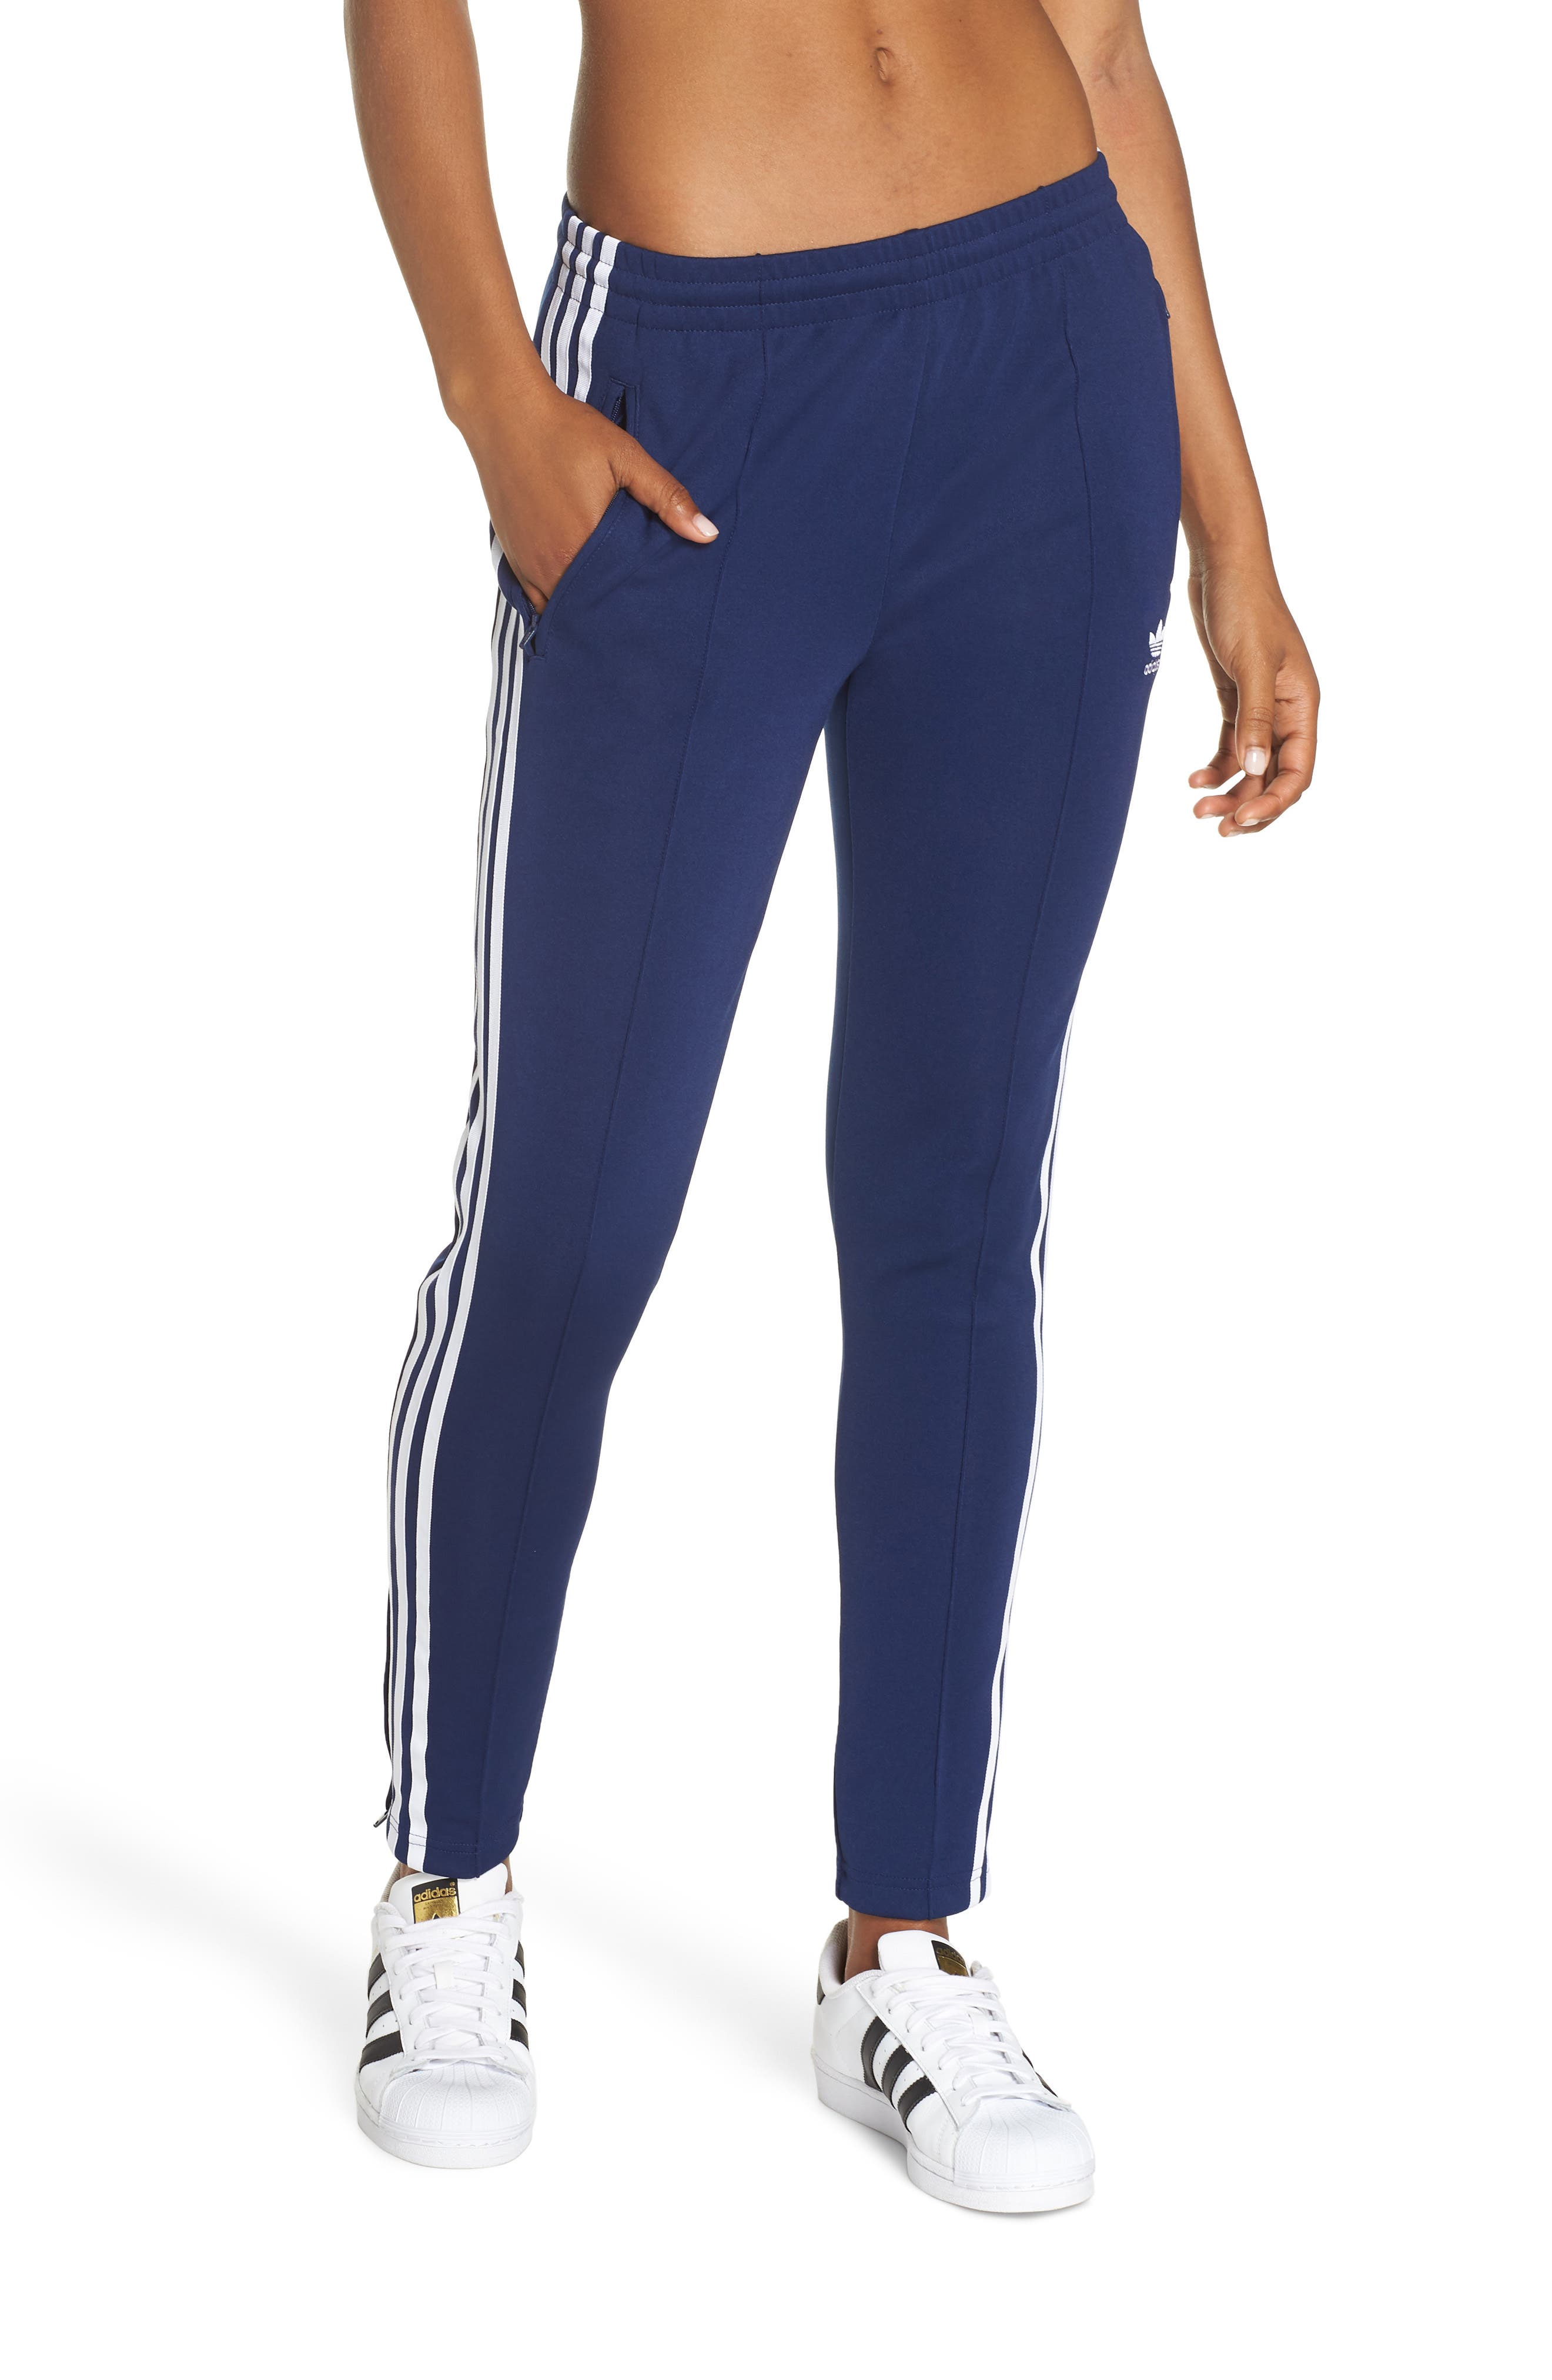 SST Track Pants,                             Main thumbnail 1, color,                             DARK BLUE